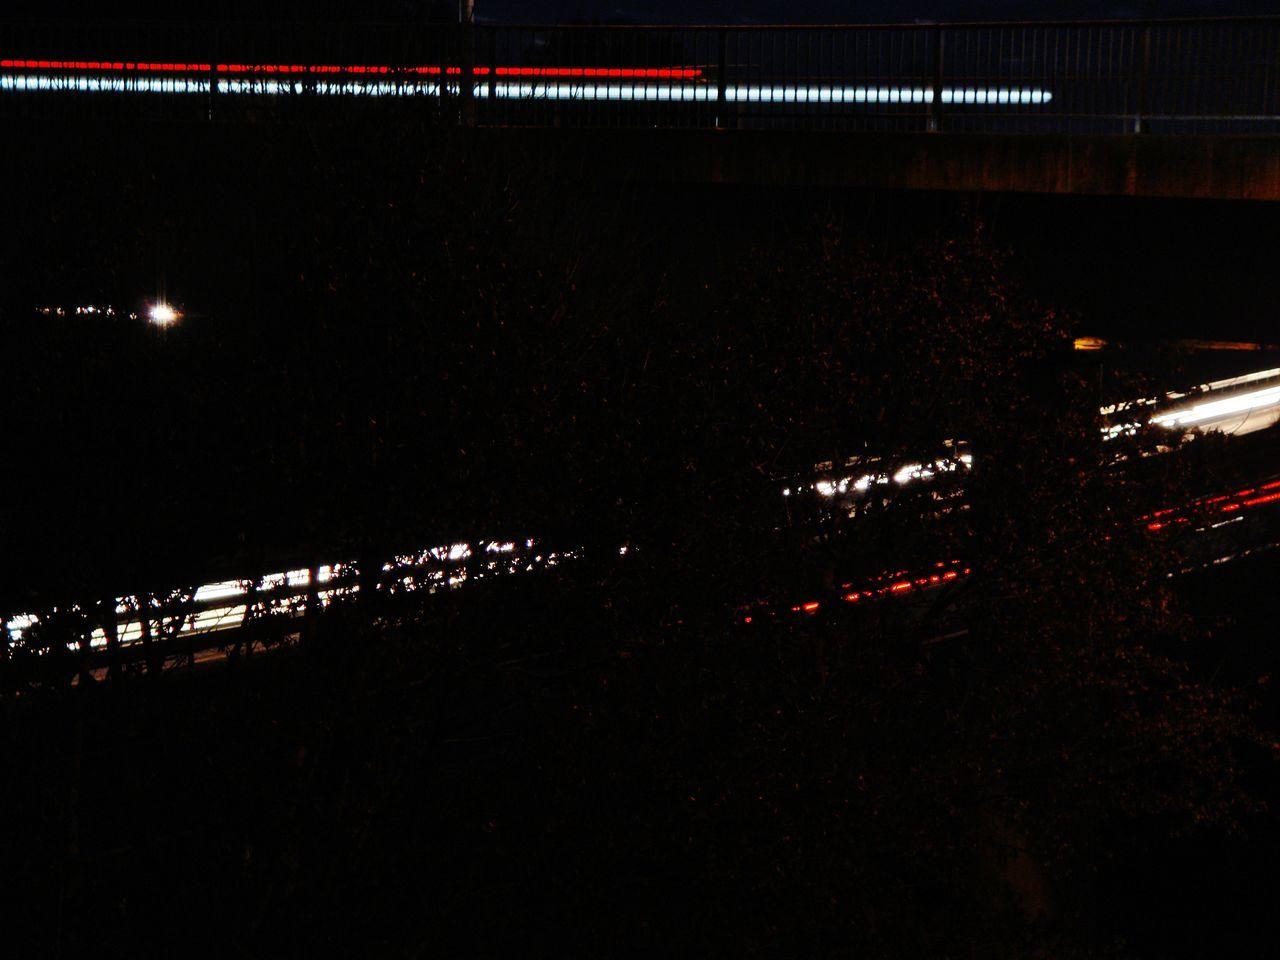 night, illuminated, transportation, no people, outdoors, city